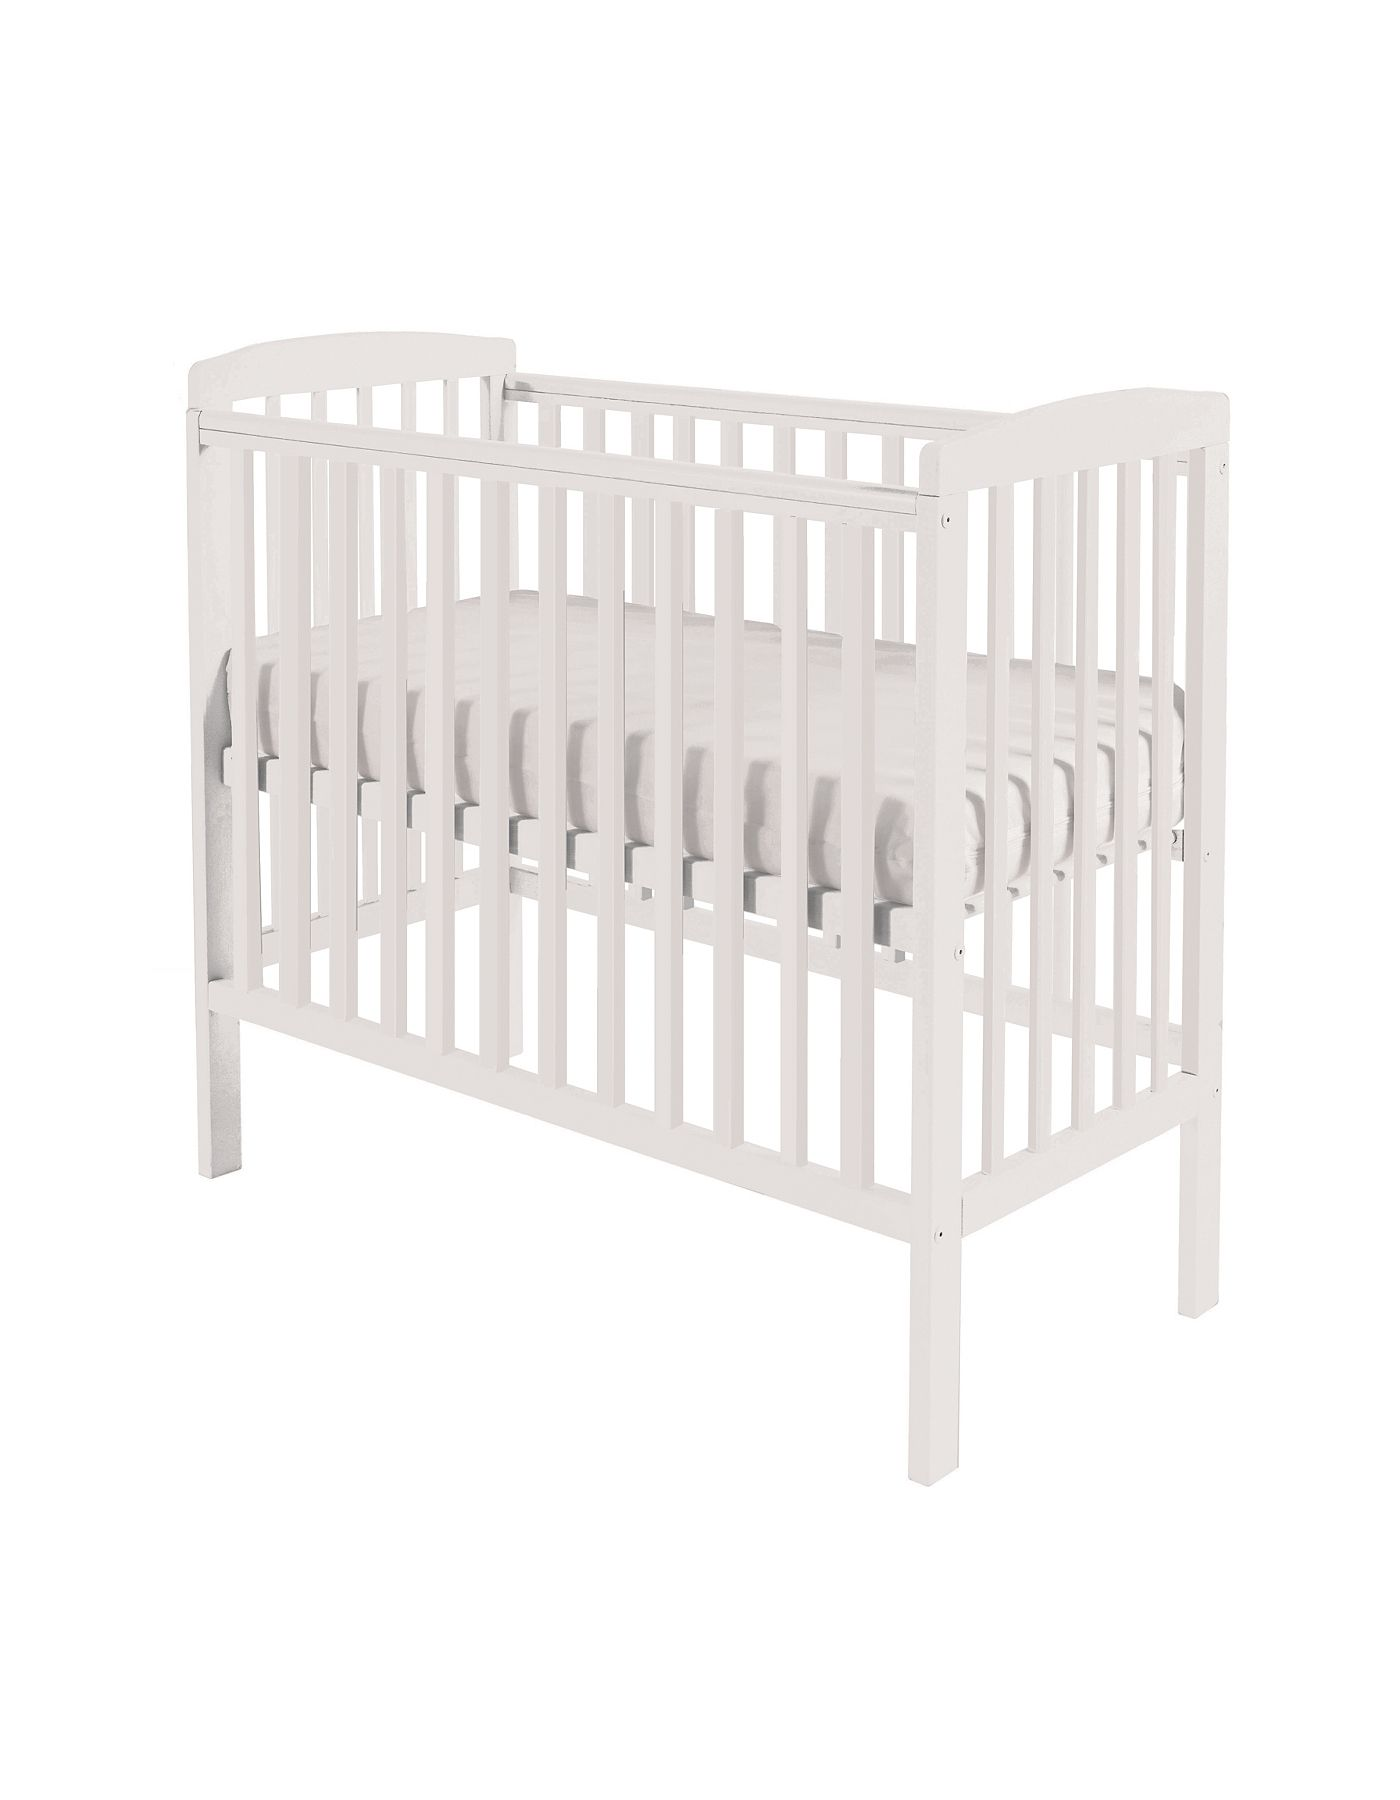 compact nursery furniture. Kinder Valley Kai Compact Cot In White | Nursery Furniture ASDA Direct